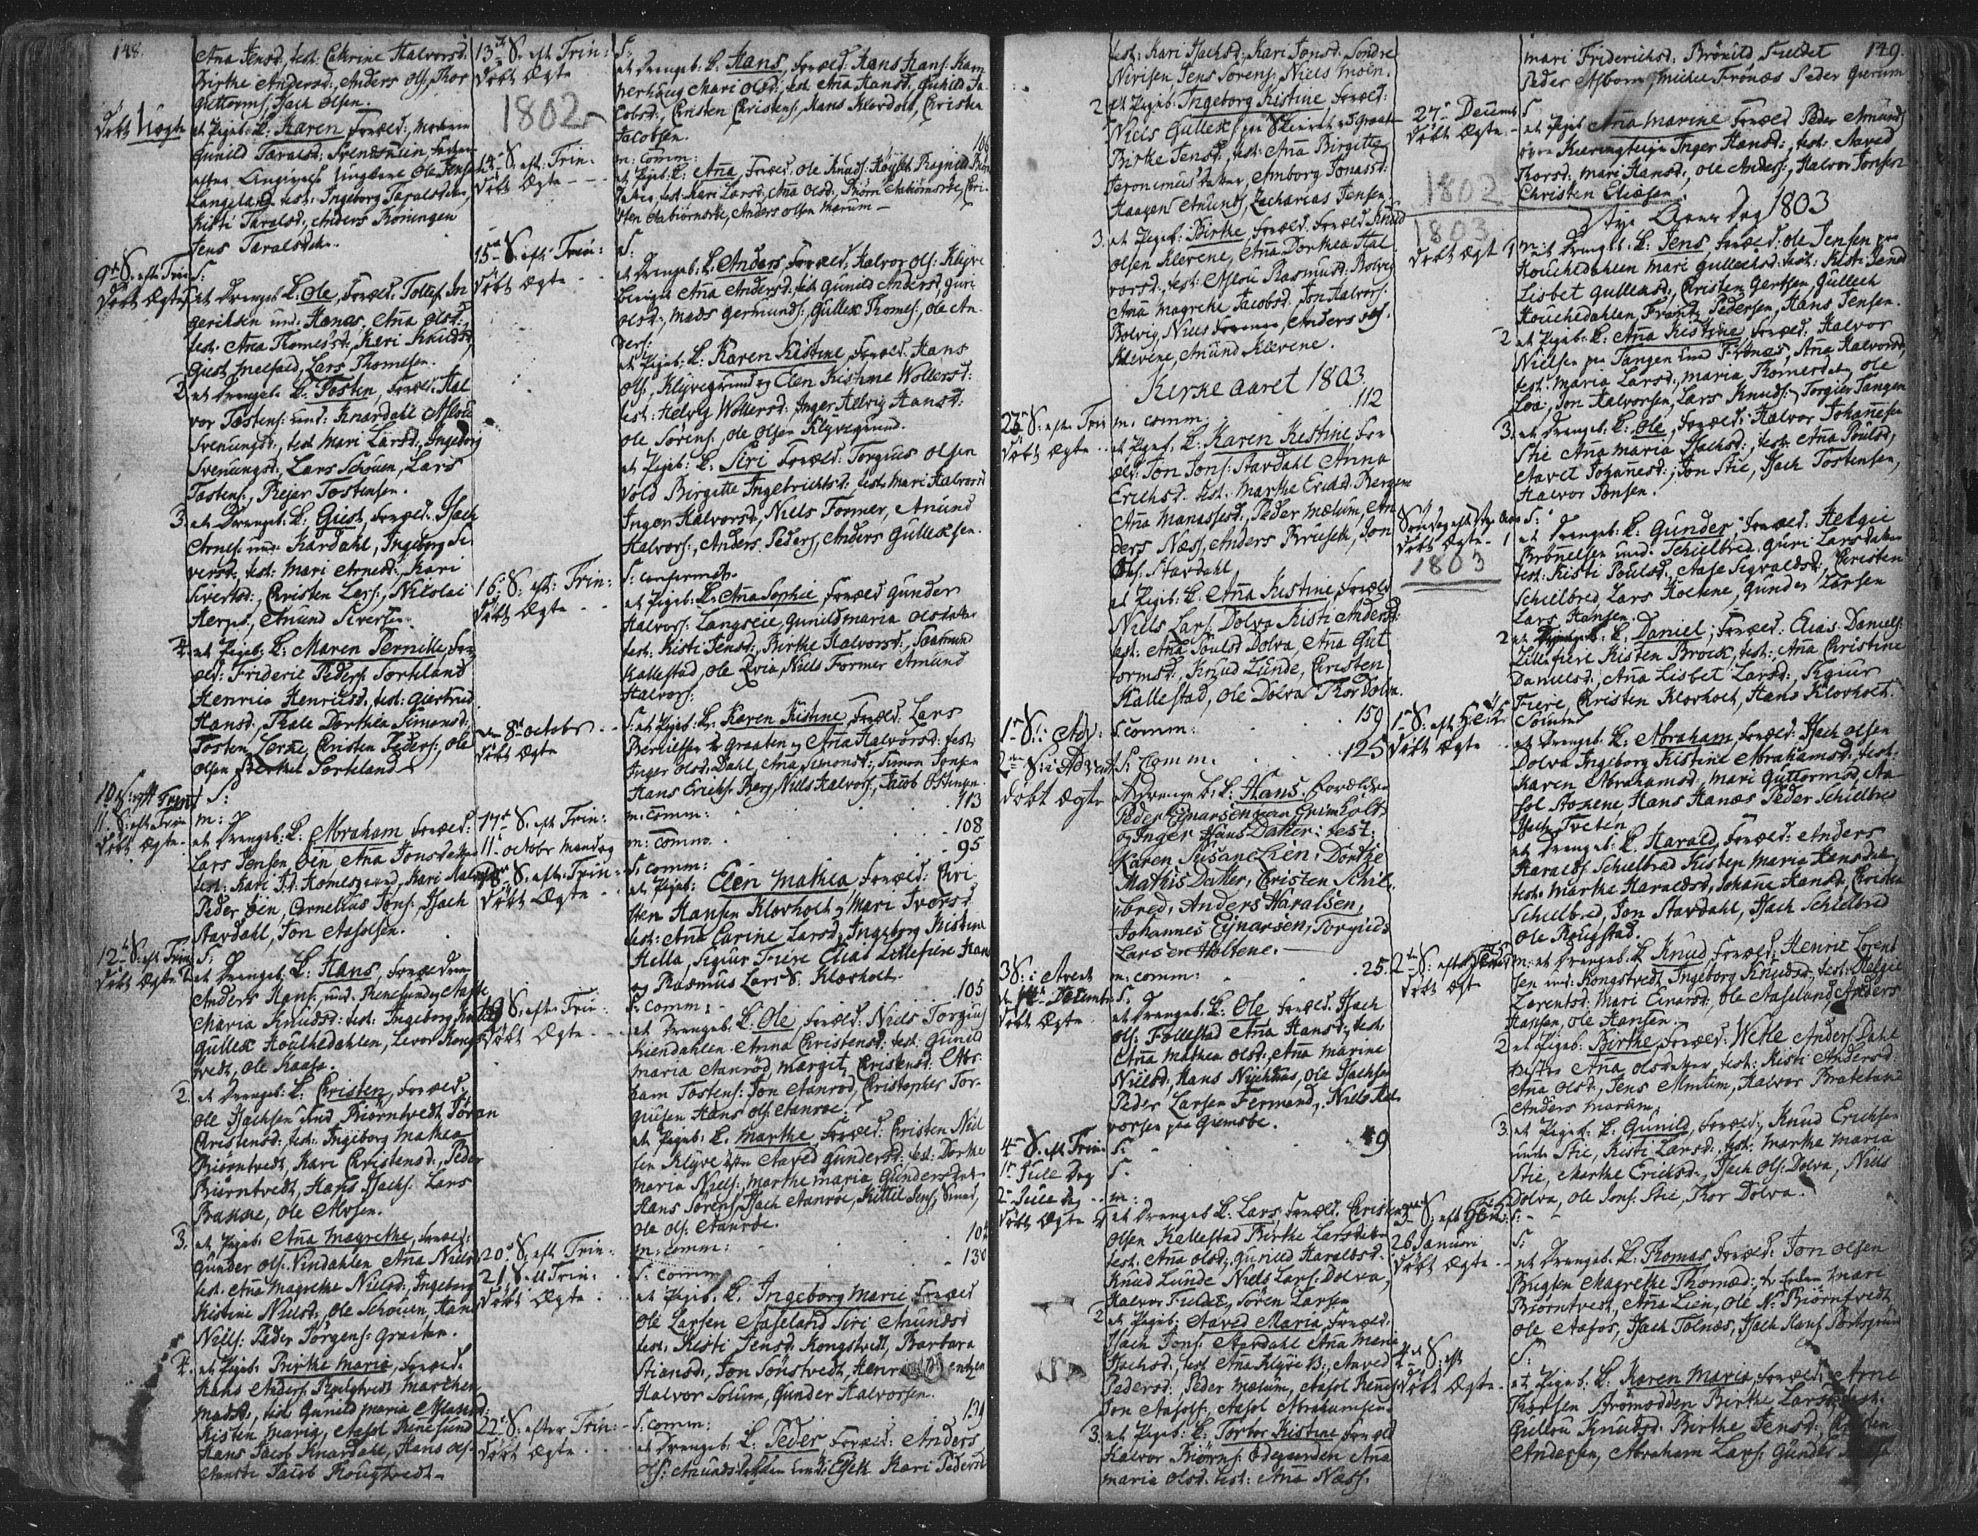 SAKO, Solum kirkebøker, F/Fa/L0003: Ministerialbok nr. I 3, 1761-1814, s. 148-149